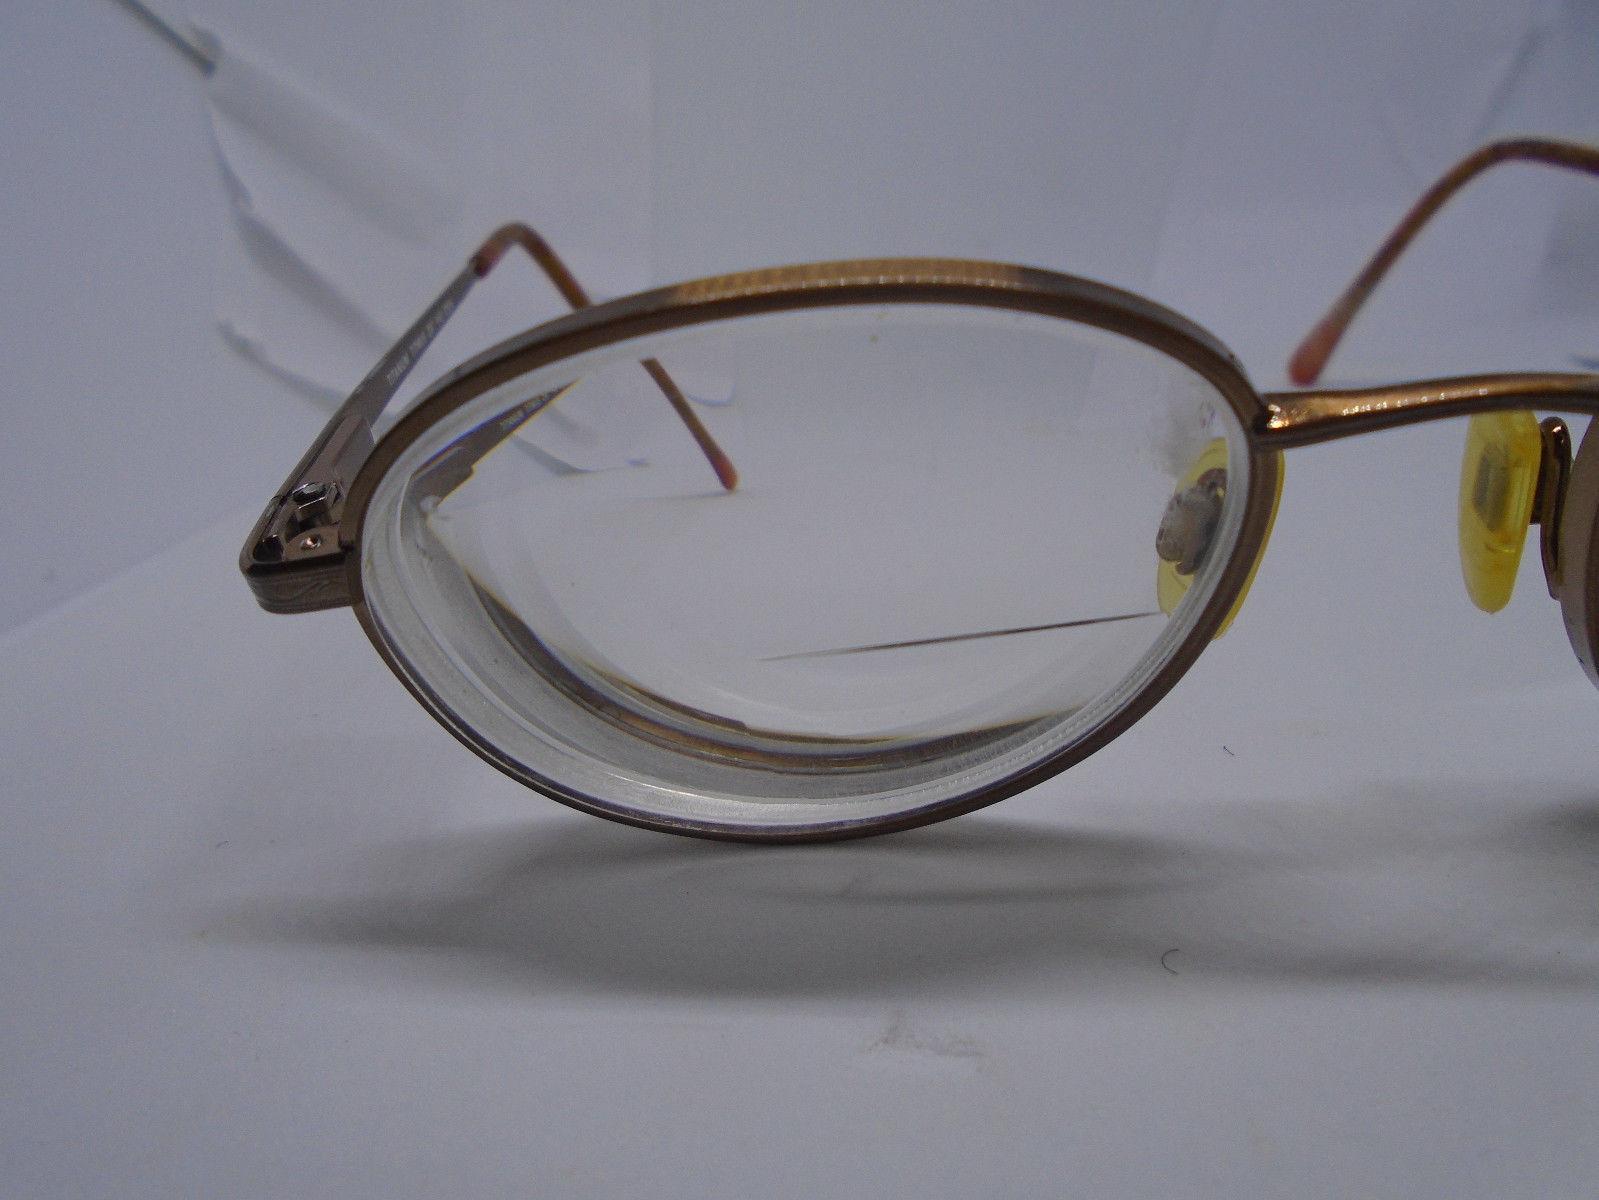 TITMUS Vintage Eyeglasses 52-20-140 TNM4 ANB and 50 similar items